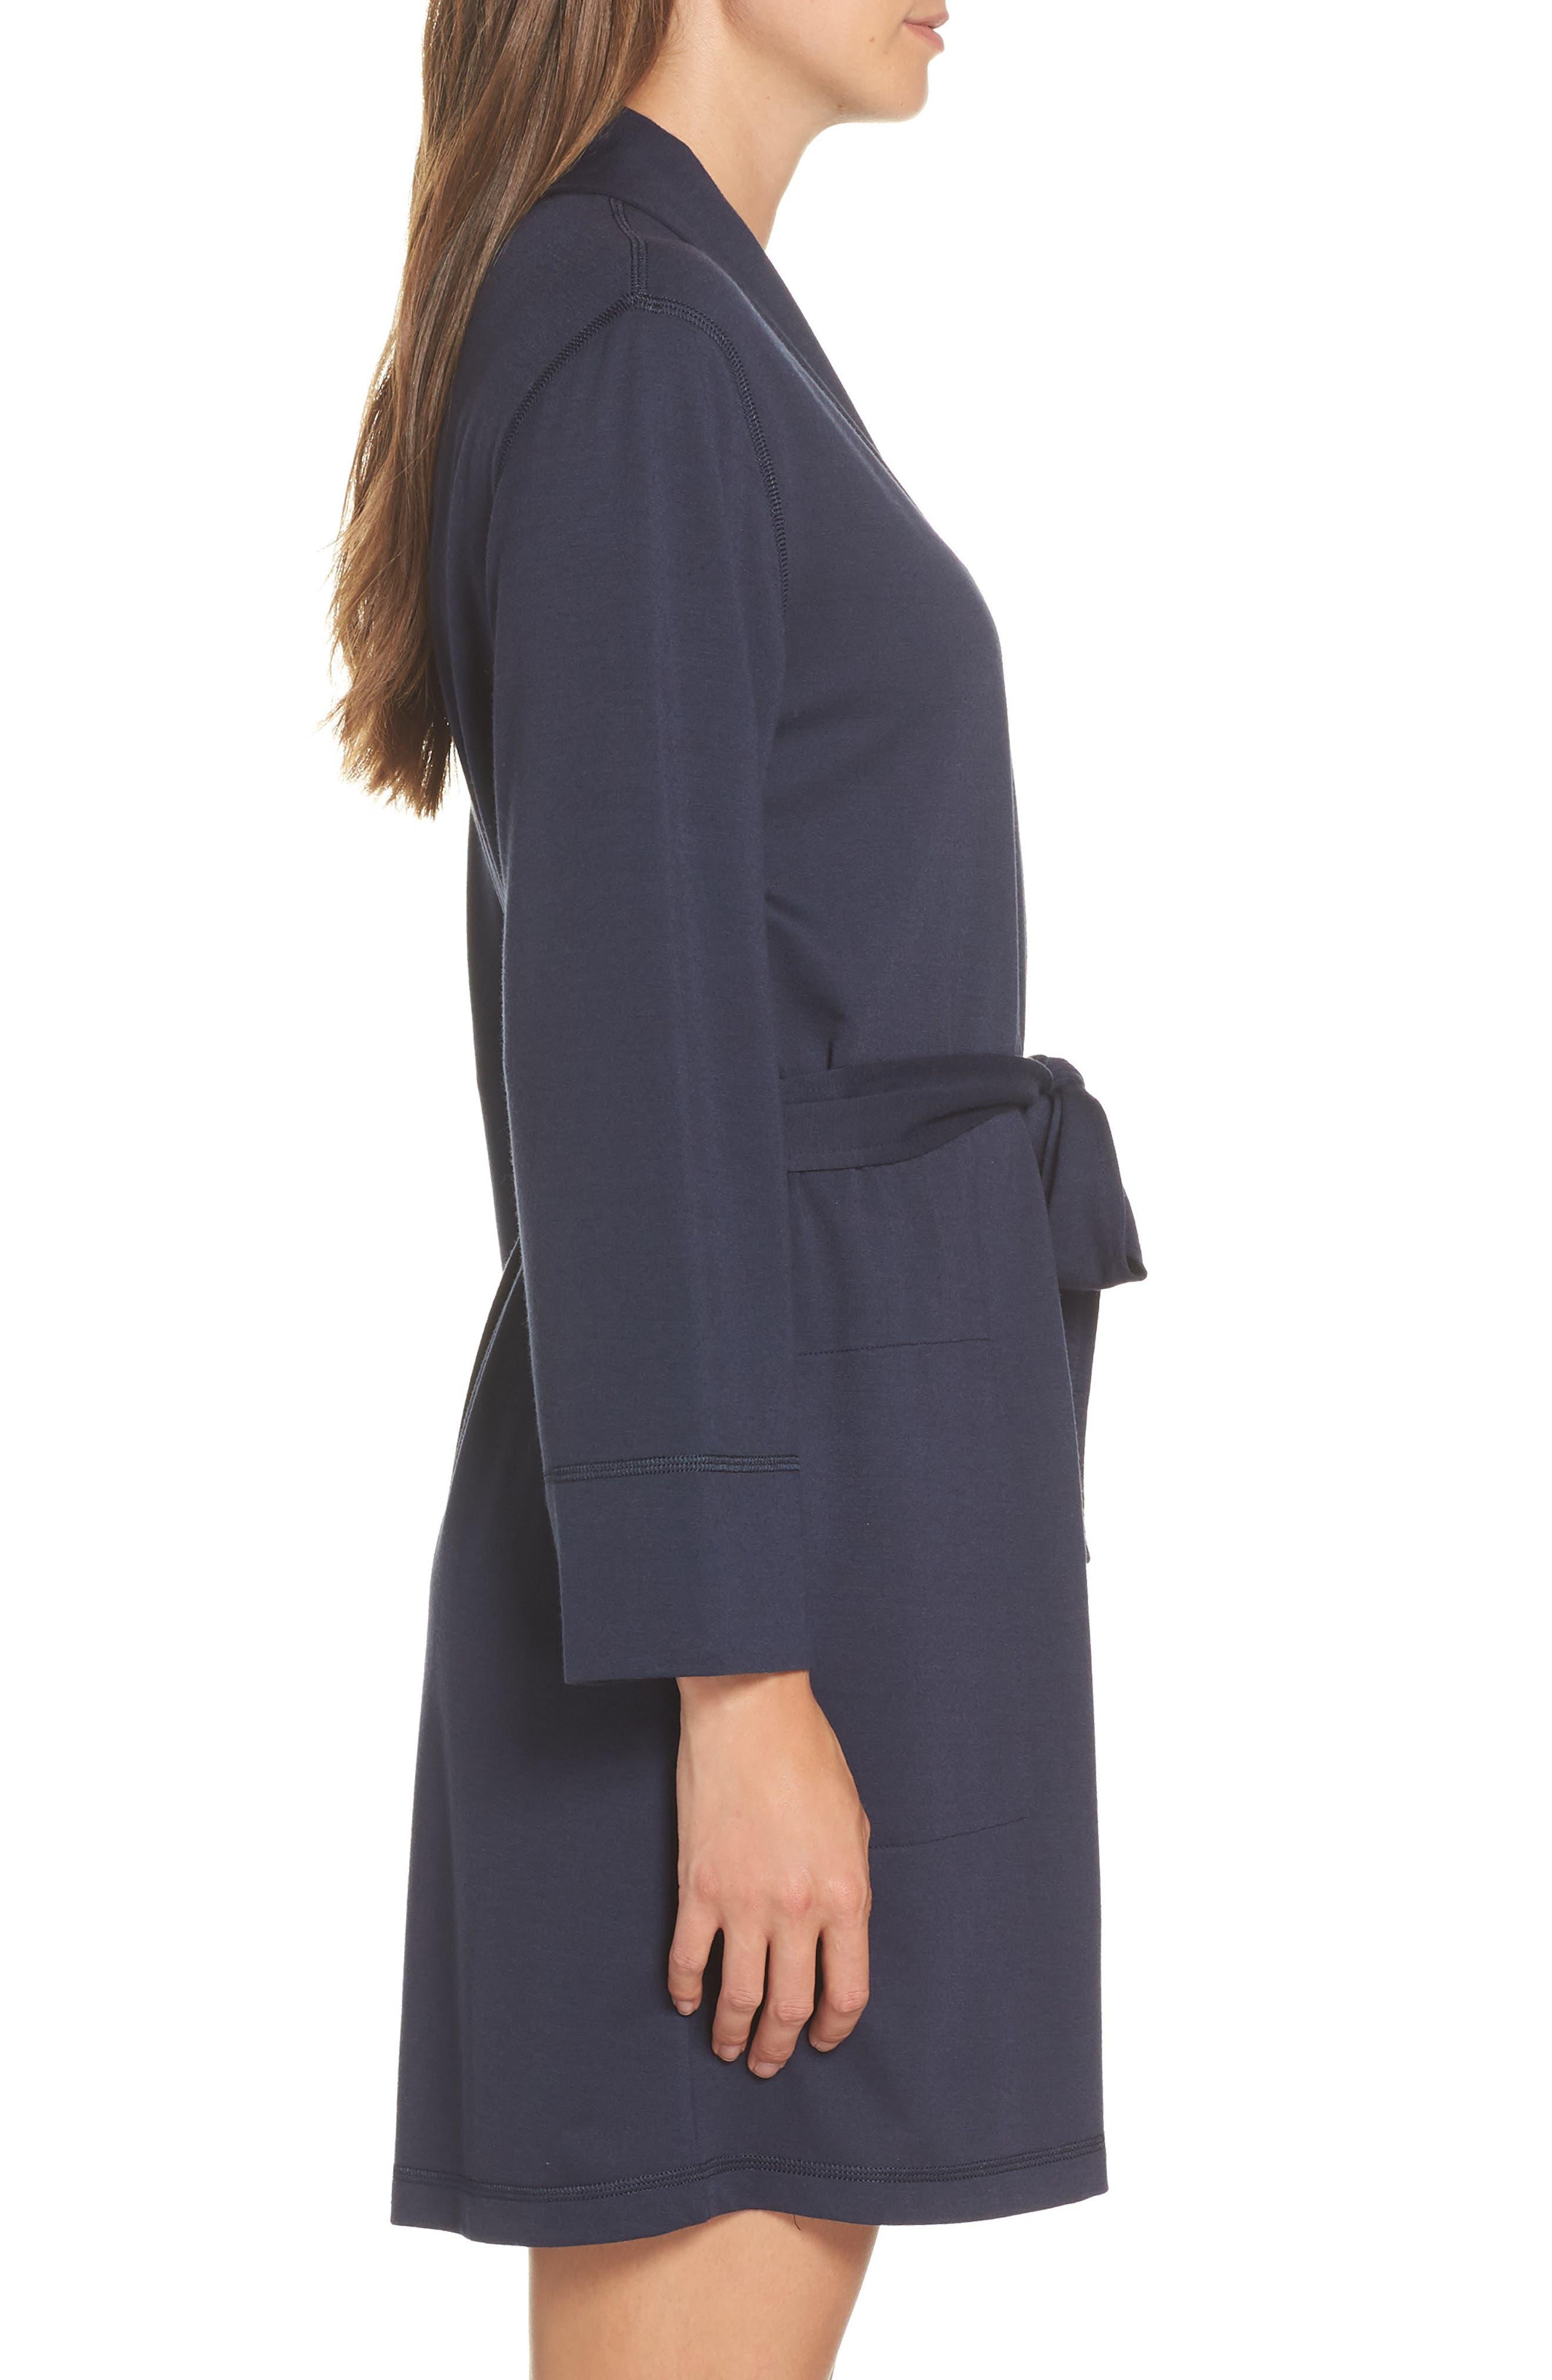 NATORI, Naya Short Robe, Alternate thumbnail 3, color, NIGHT BLUE